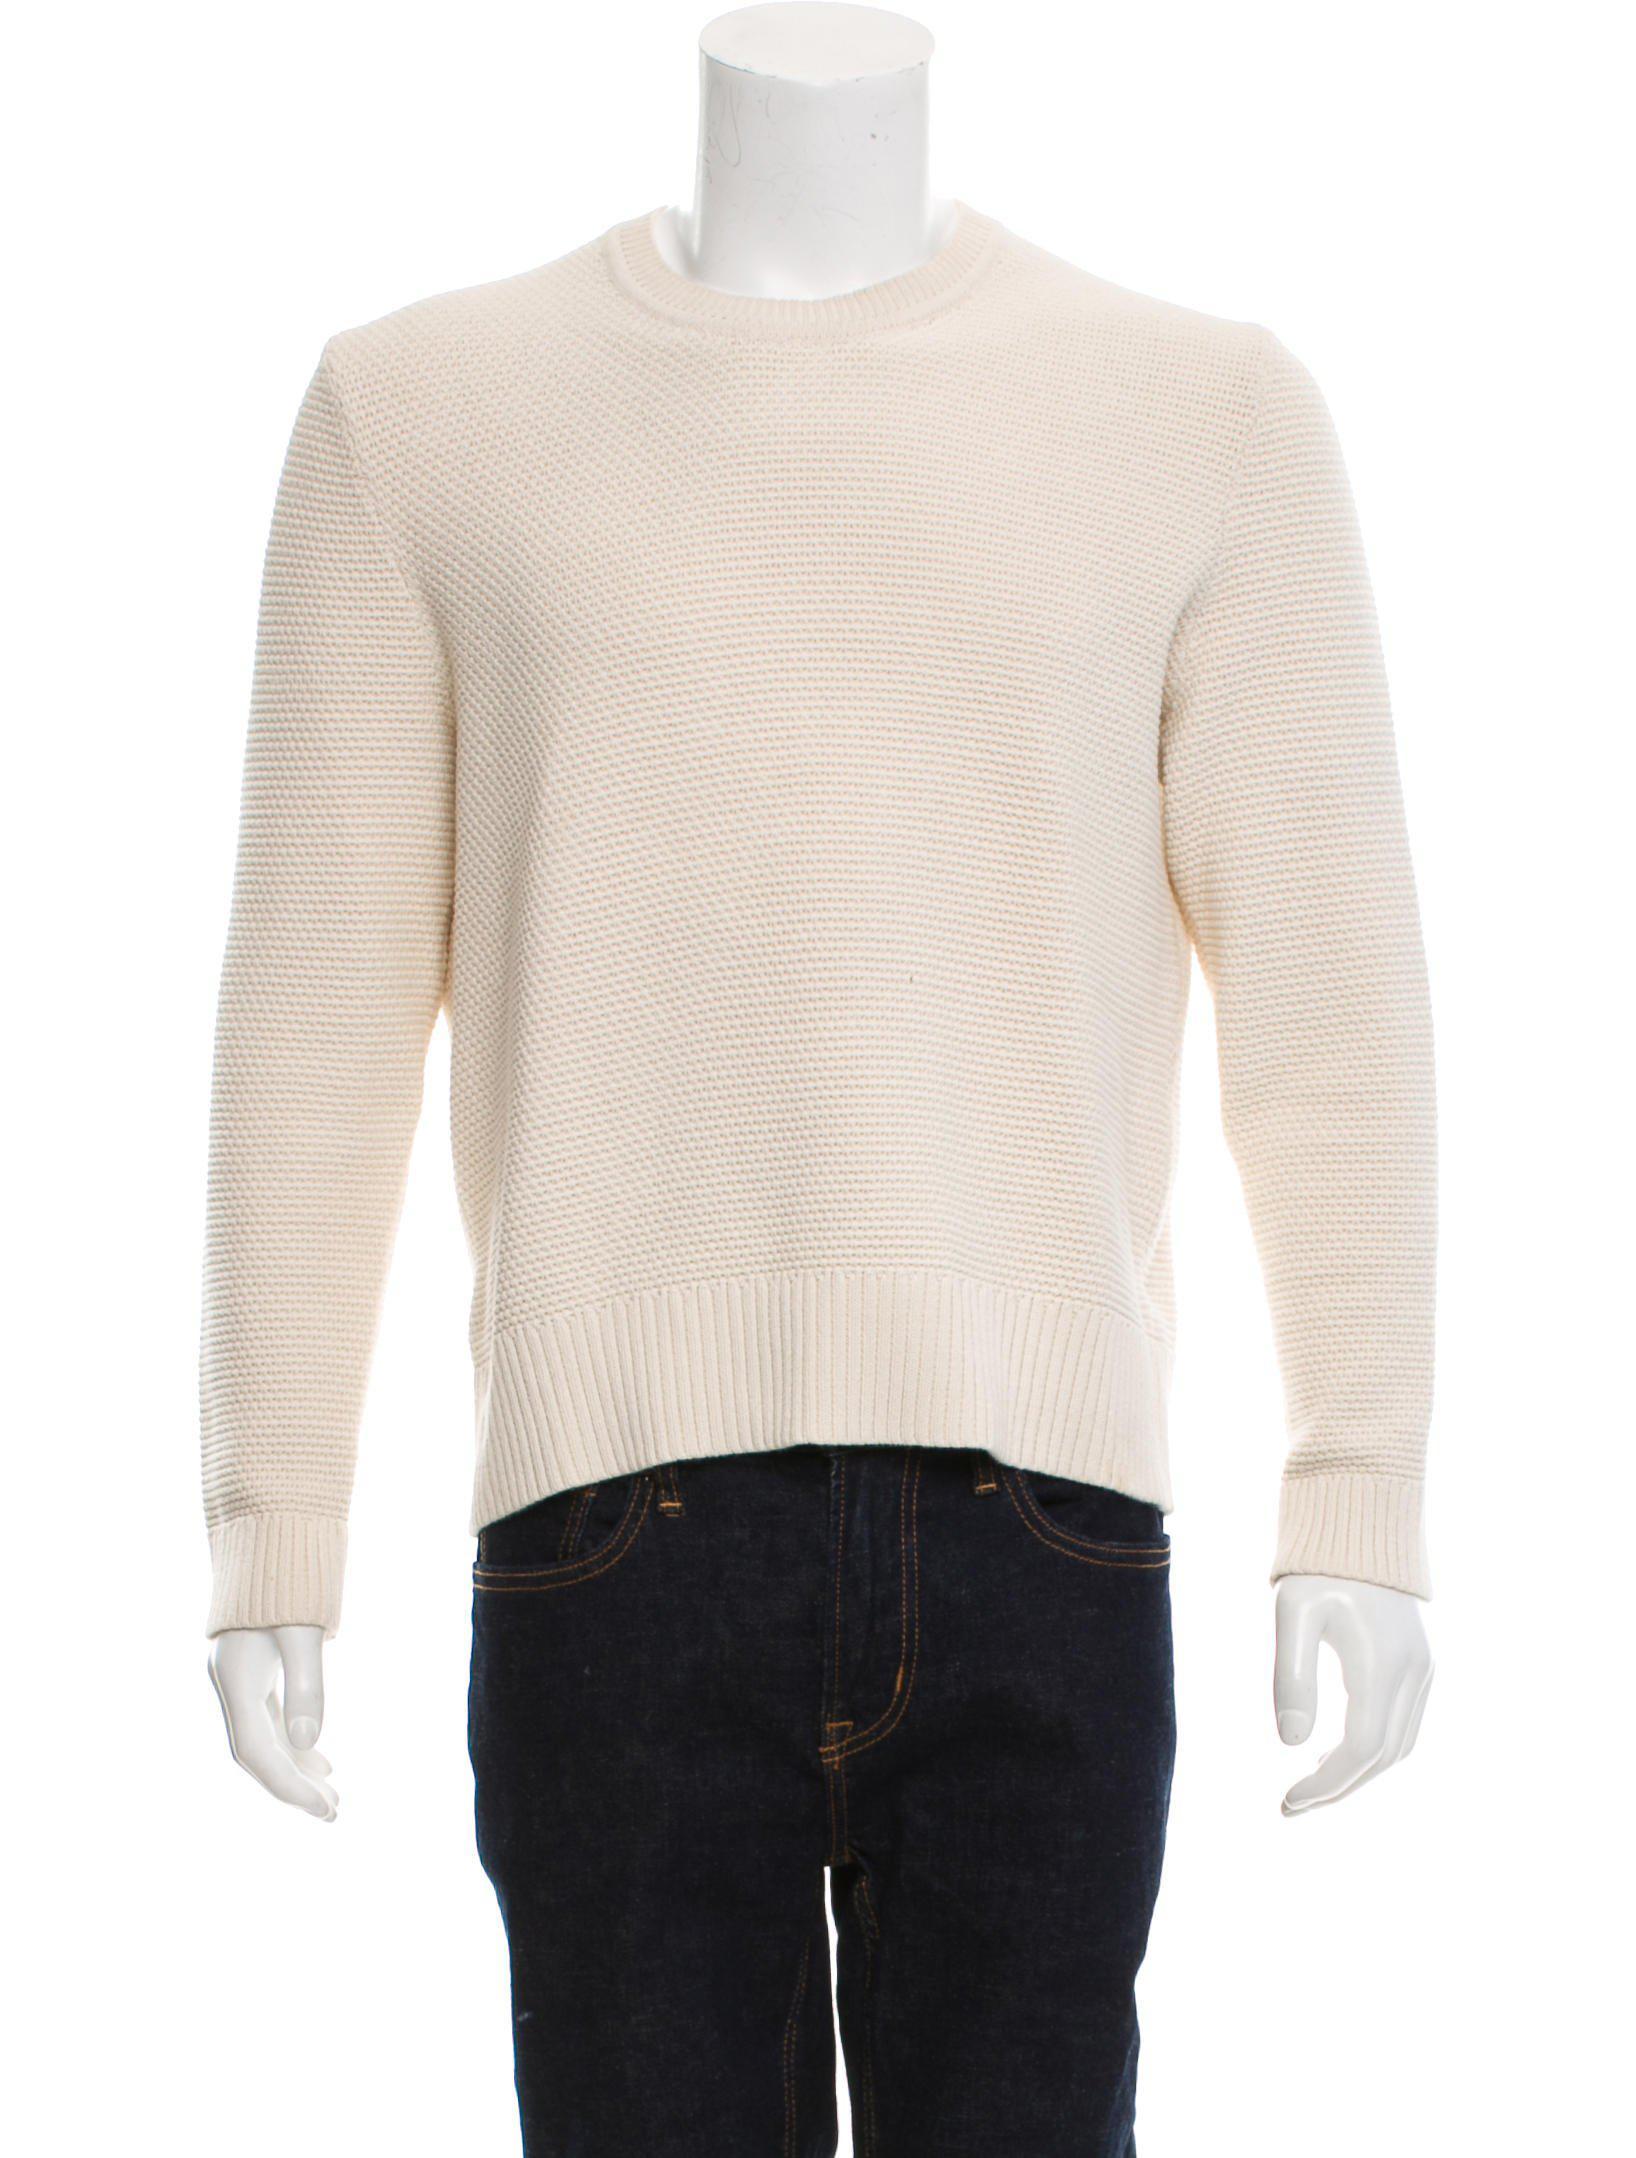 Selected Homme Mens Vince Bubble Knit Regular Cotton Jumper Crew Neck Sweater